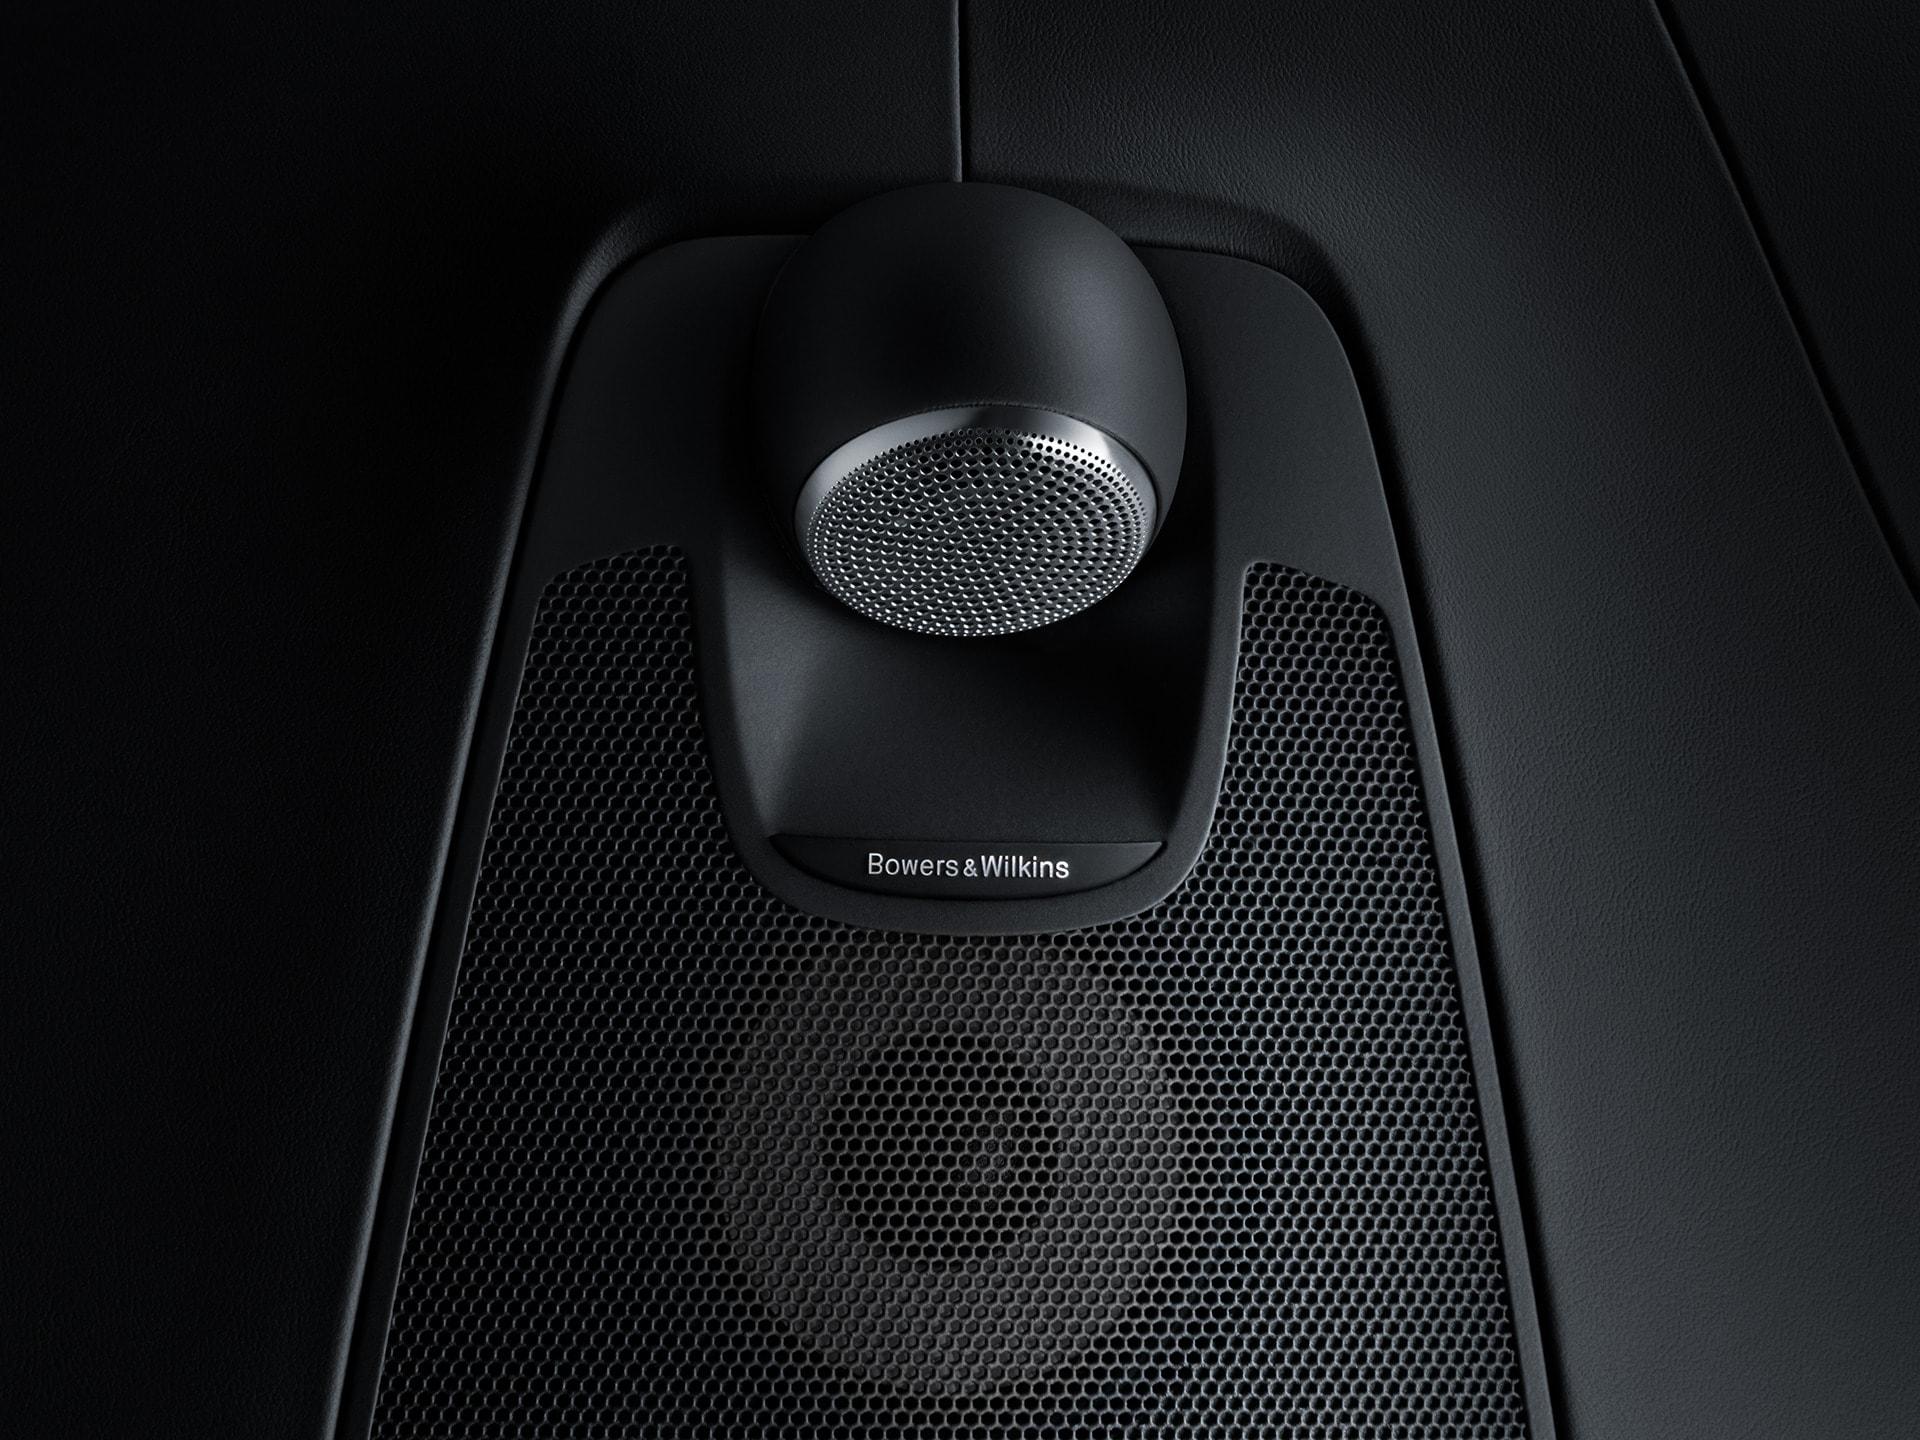 Sistem audio Bowers & Wilkins în interiorul unui Volvo XC60